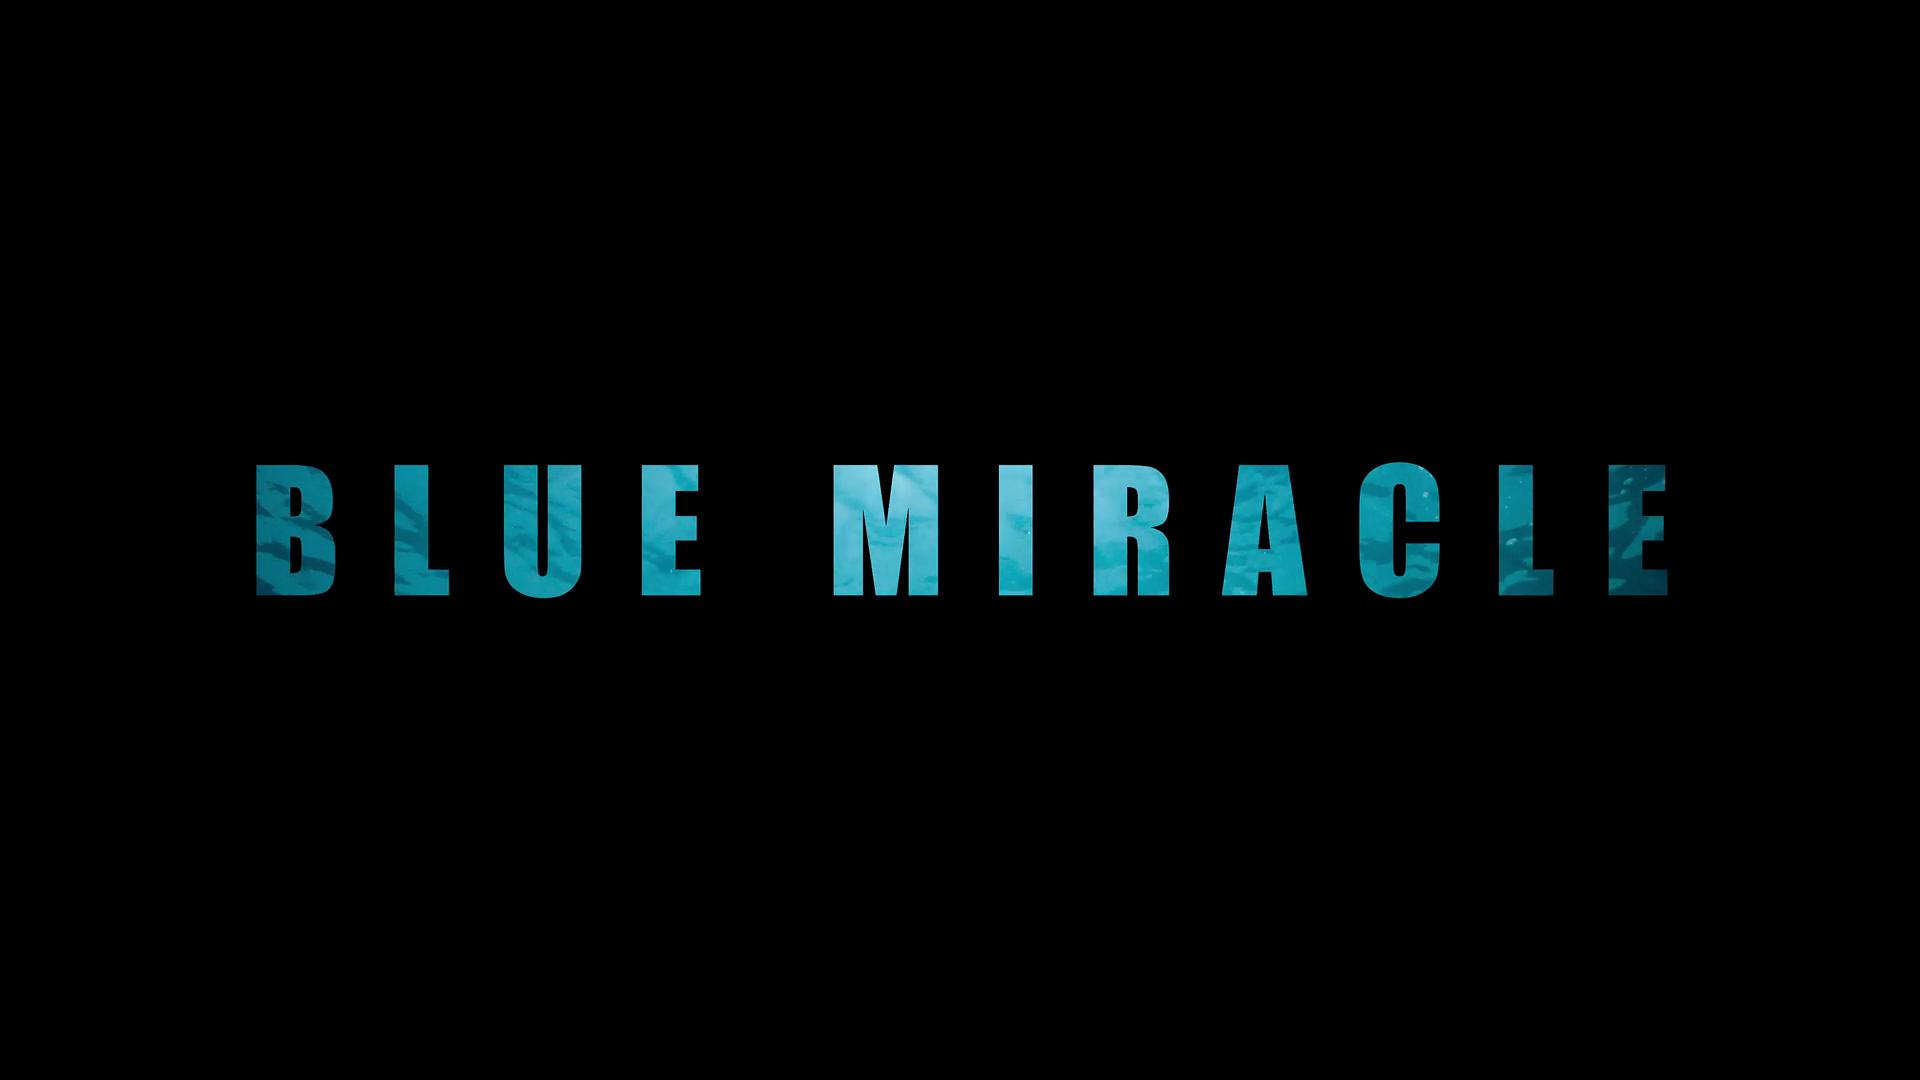 Milagro azul (2021) 1080p WEB-DL Latino